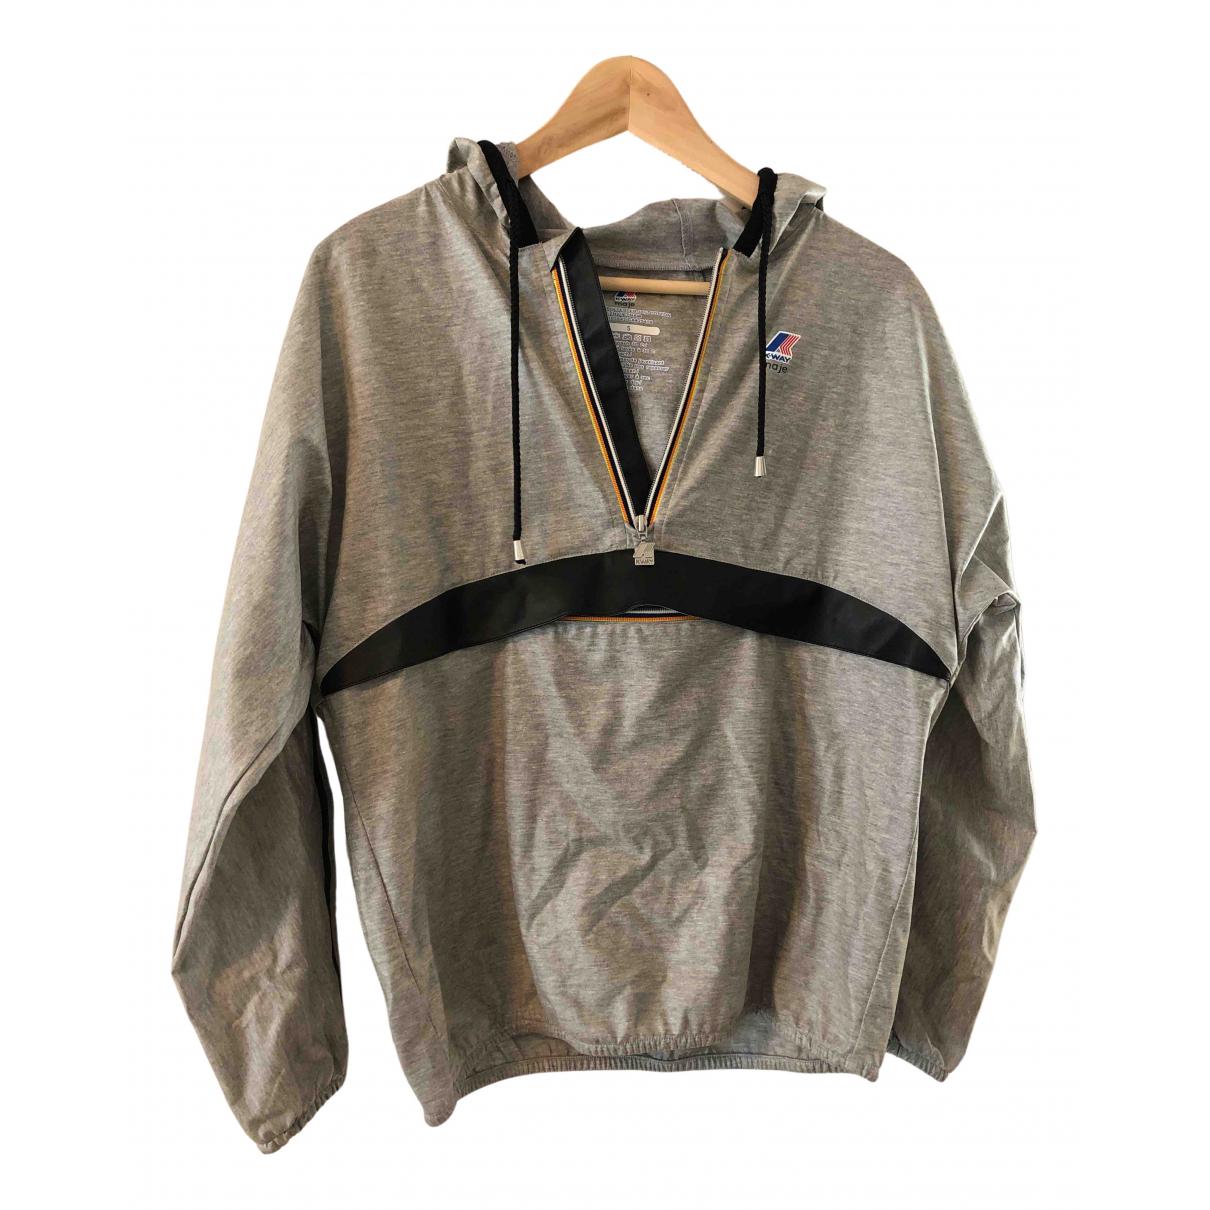 Maje \N Grey jacket for Women S International